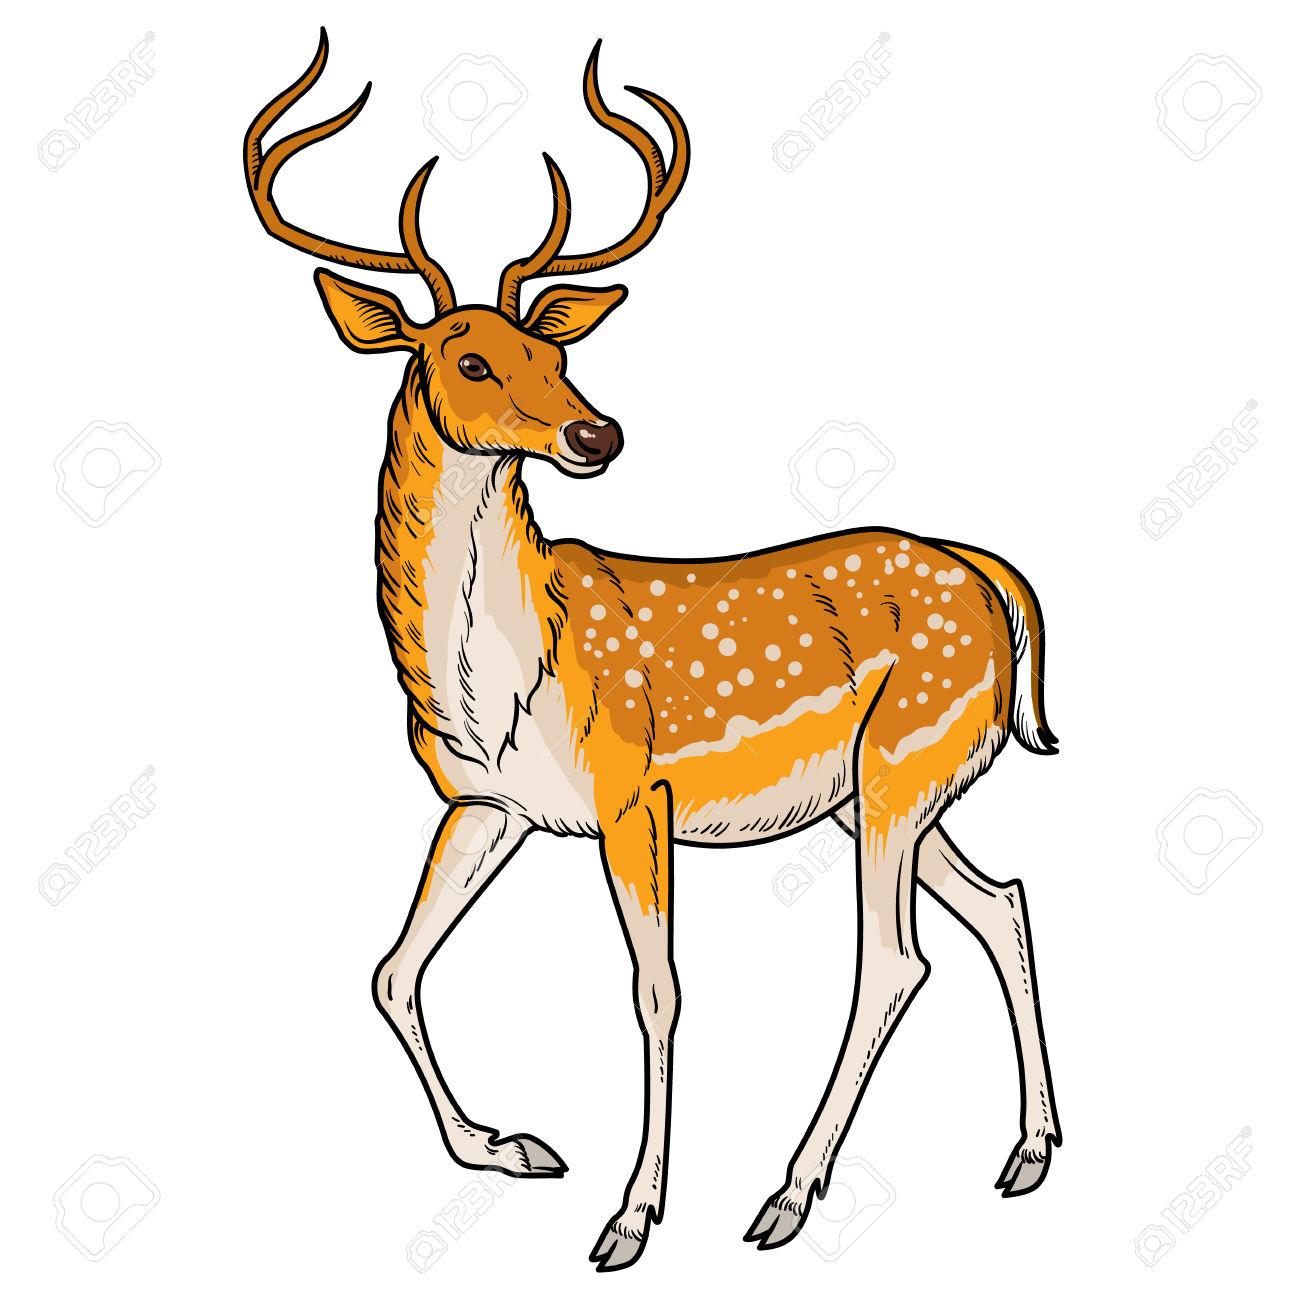 Deer clipart. Baby at getdrawings com